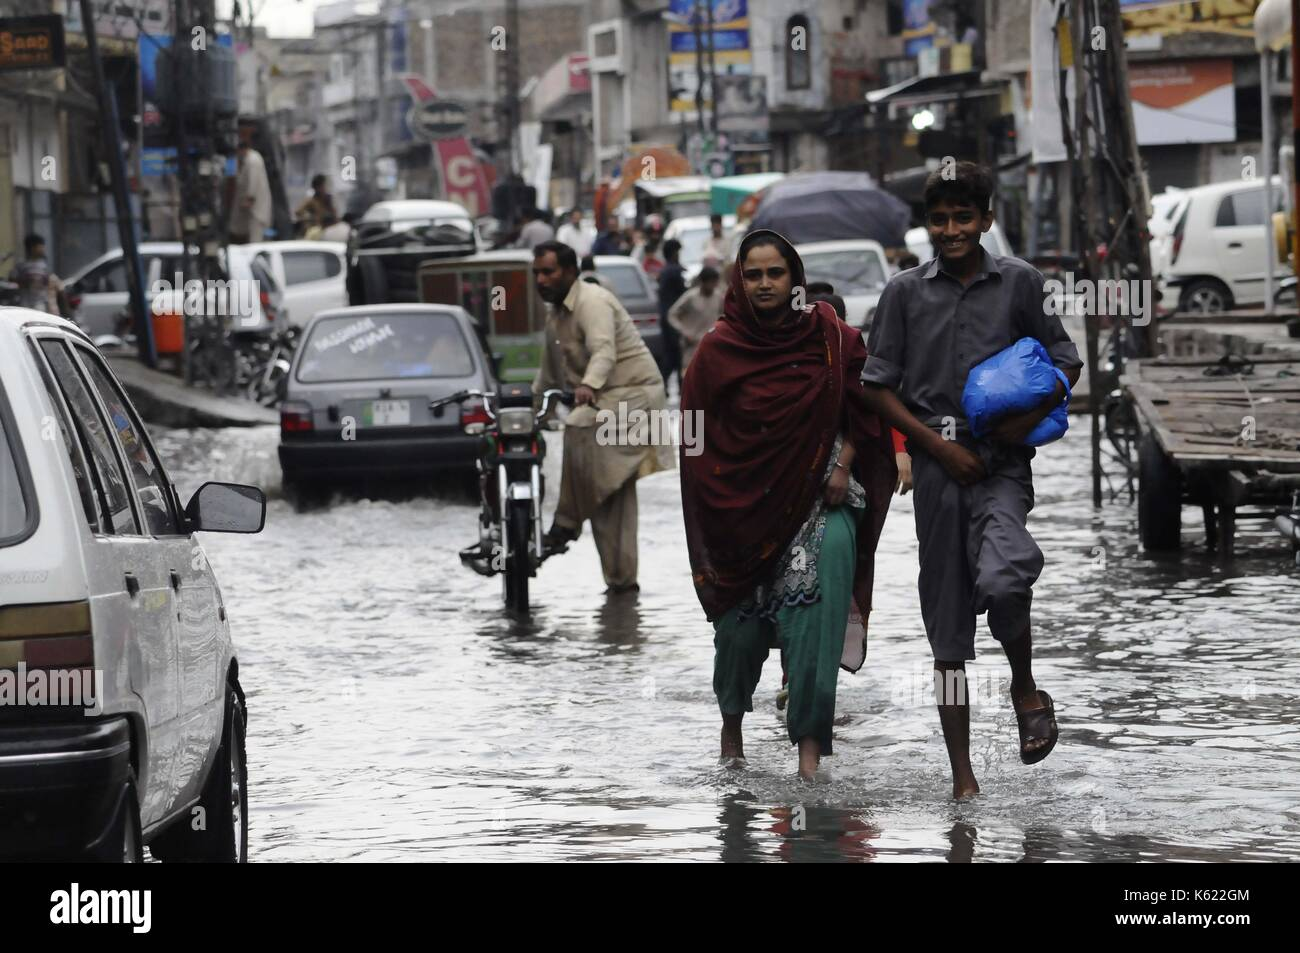 Sadiqabad Area Stock Photos & Sadiqabad Area Stock Images